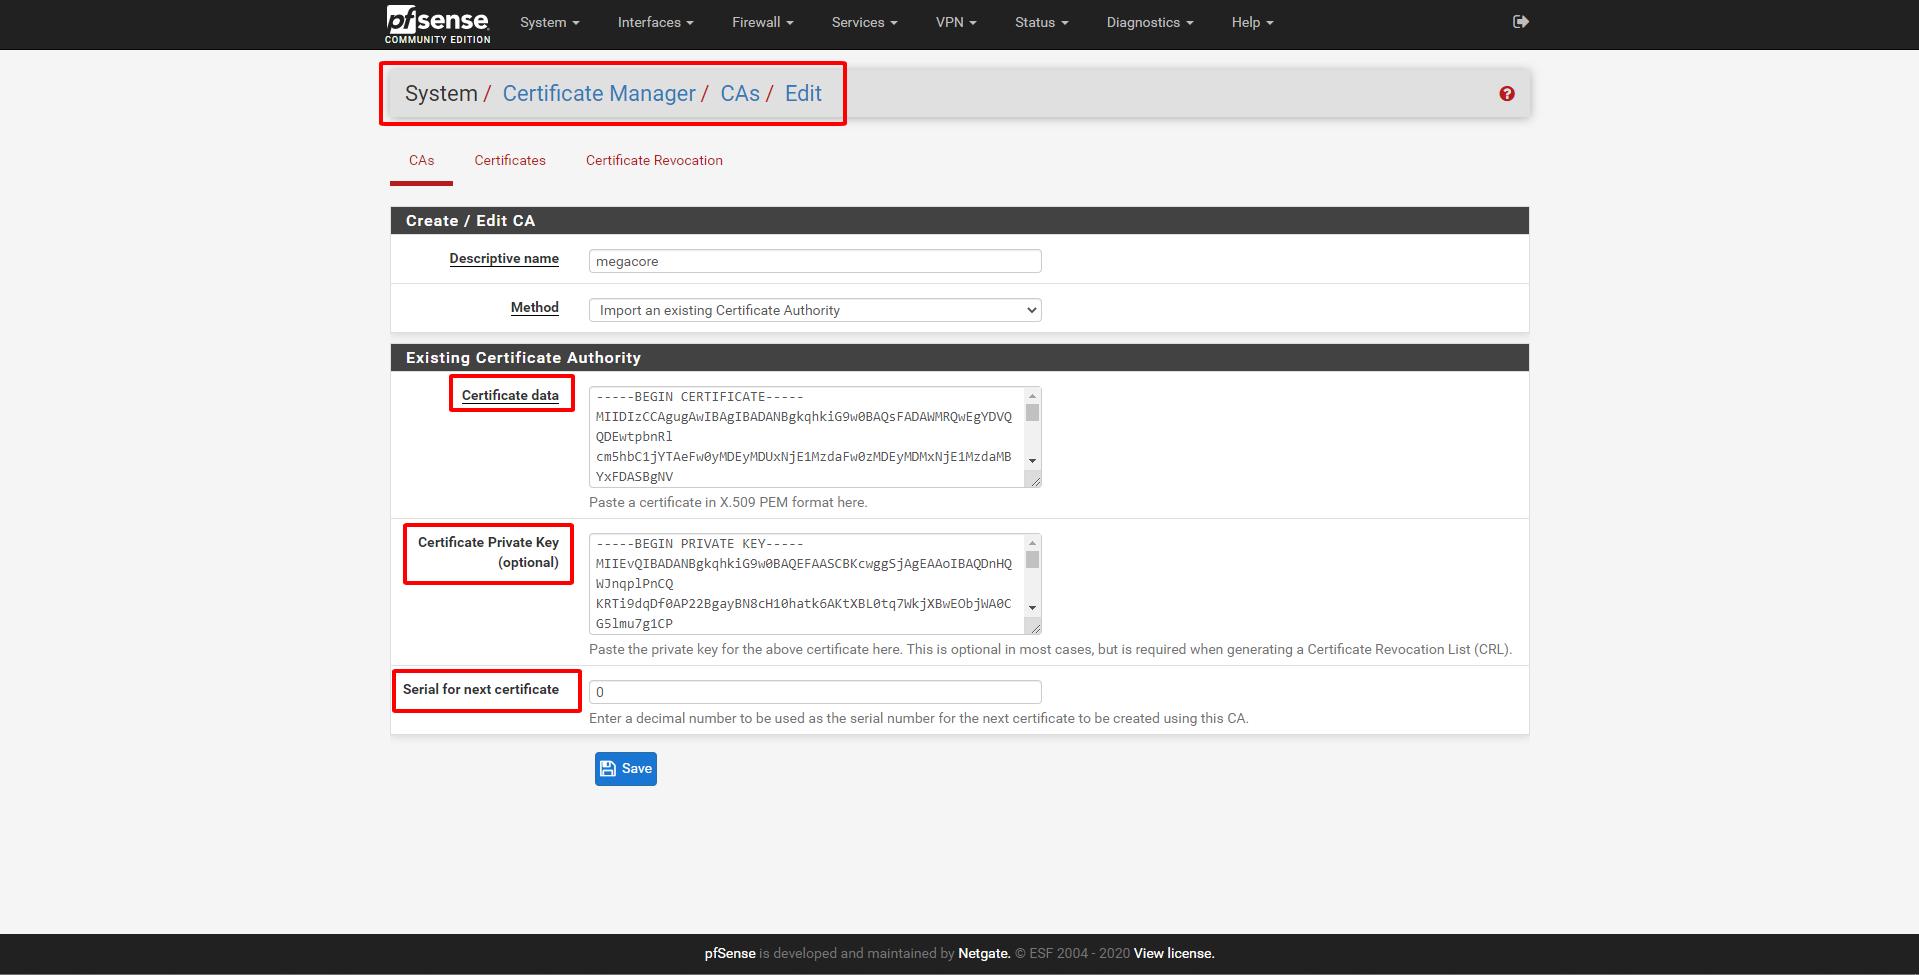 pfsense 11 - Certificate Management (Tìm Hiểu Về PfSense Phần 8)